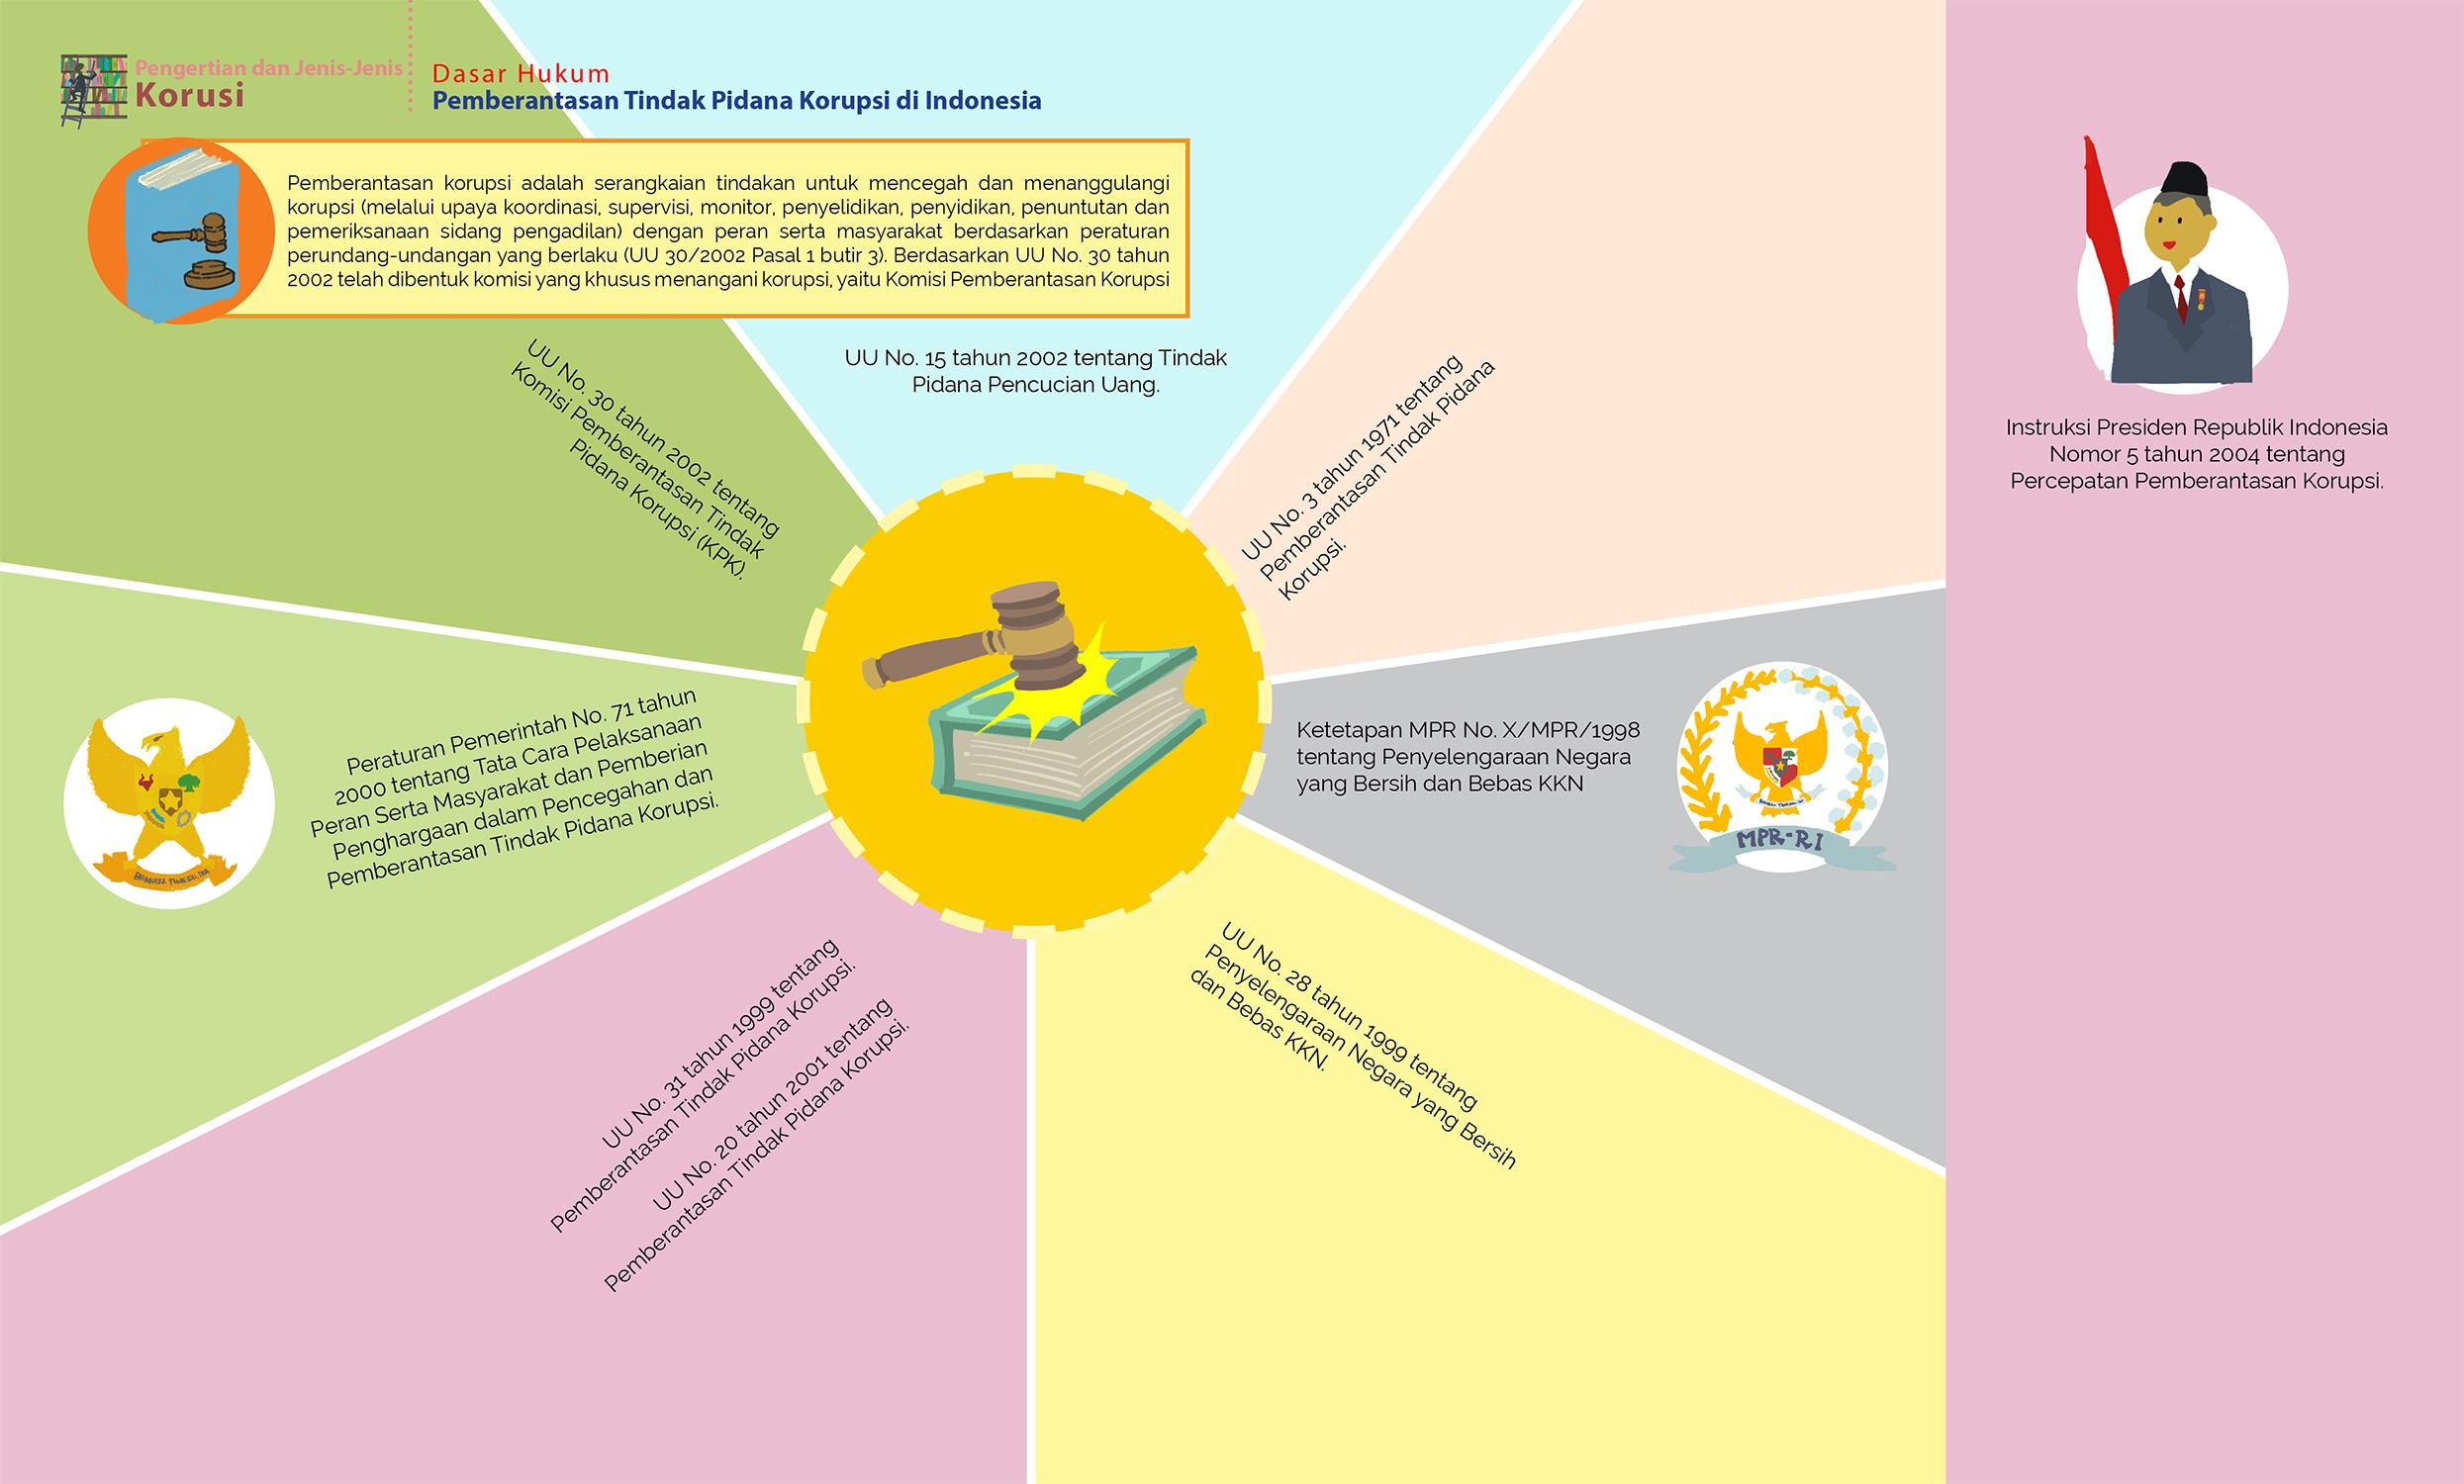 Mencegah Praktek Korupsi Kolusi Dan Nepotisme Dalam Bisnismu